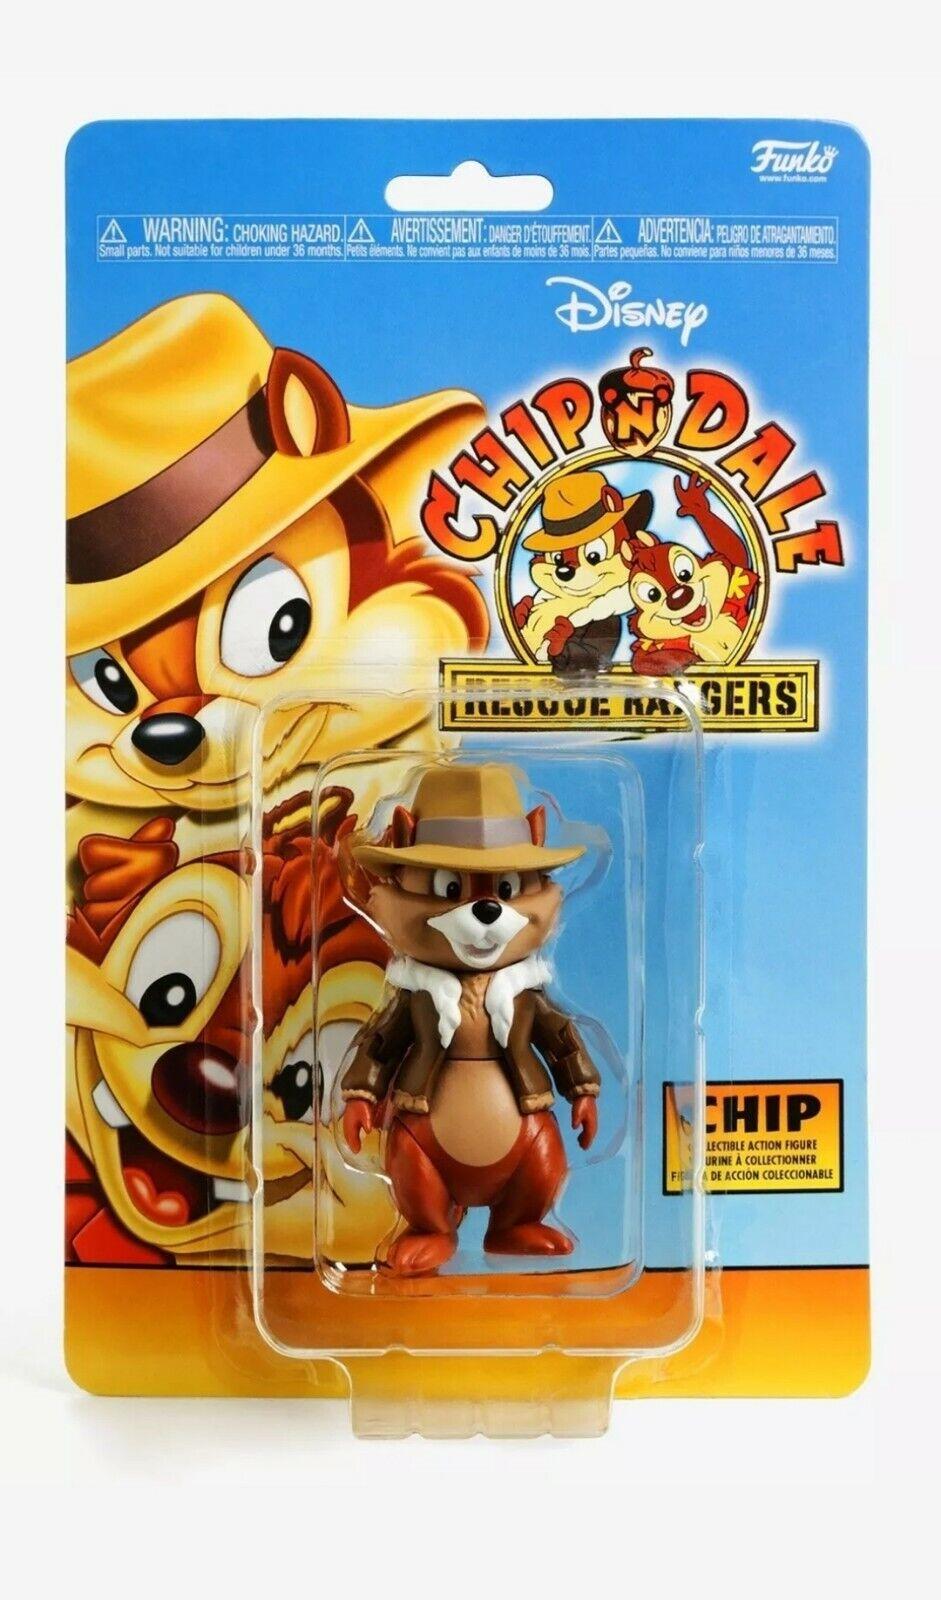 Playmobil Kind Kinder Hut Helm Mütze Haube Turban Reiterhelm Basecap Kappe City